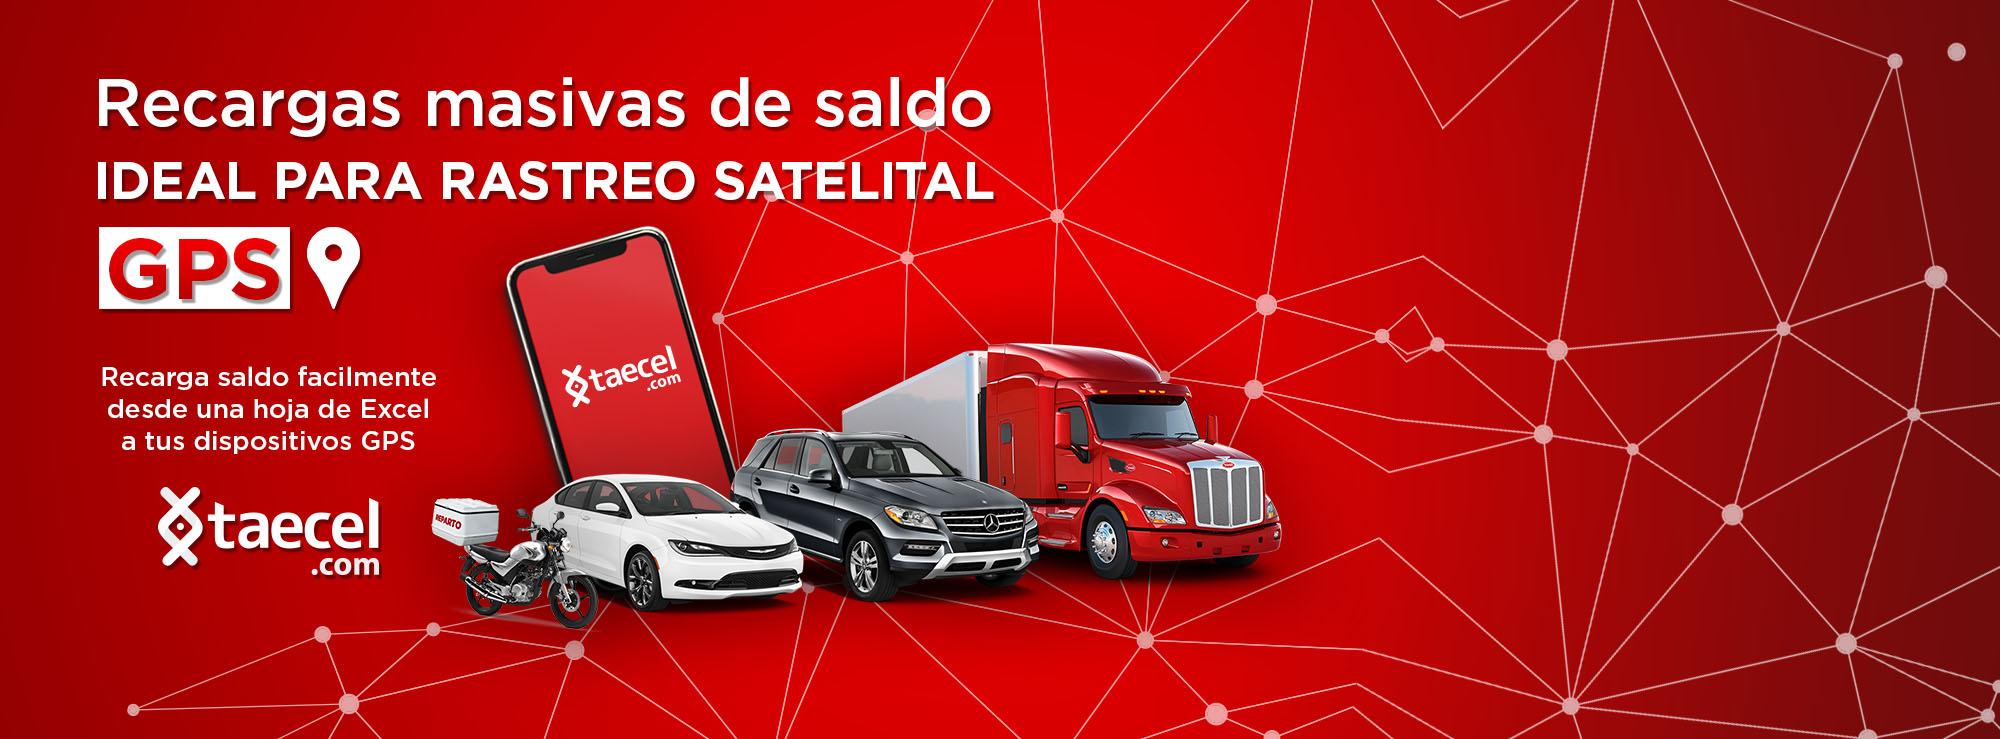 Con TAECEL Vende multirecargas de tiempo aire de todas las compañias celulares en México Recargas Telcel, Sistema de recarga masiva de saldo para celular ideal para empresas de geolocalización y rastreo GPS , para todas las compañias de telefonia celular en México, recarga chips GPS